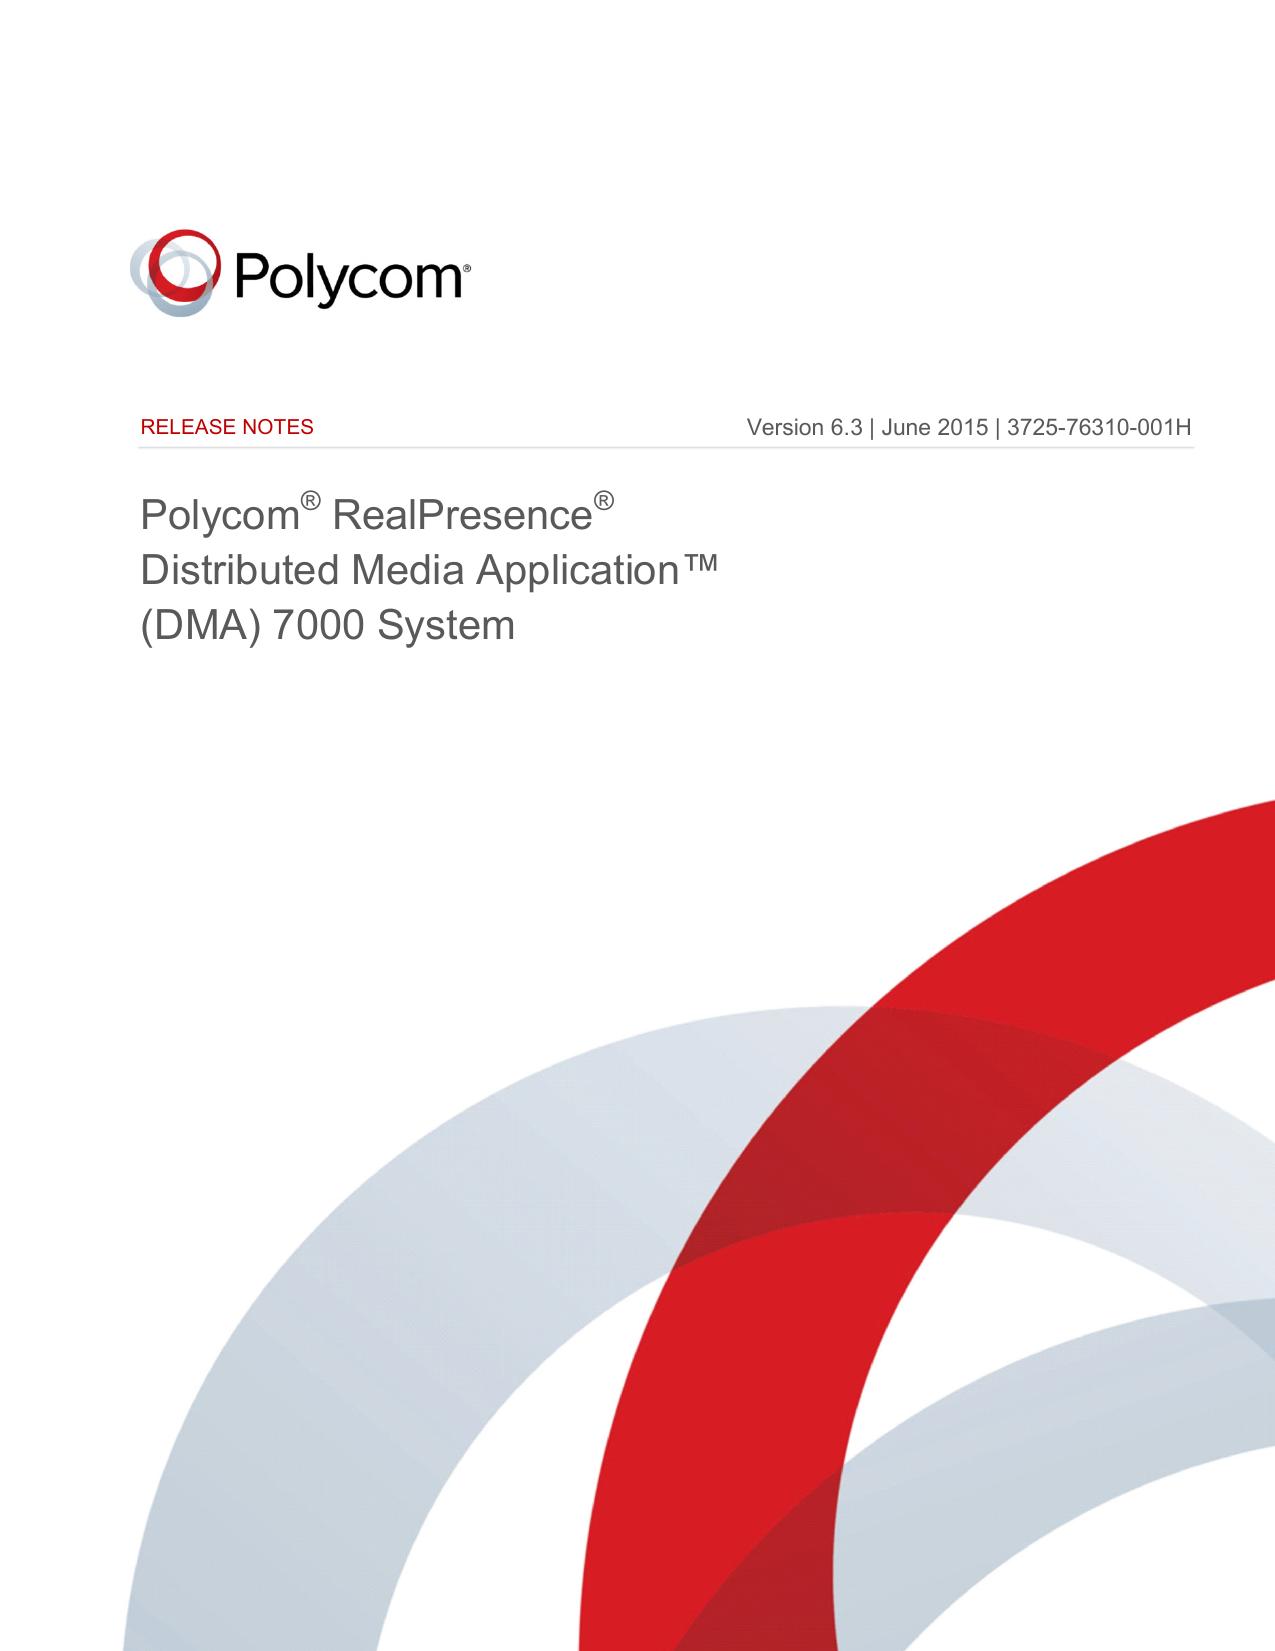 Polycom® RealPresence® Distributed Media Application™ (DMA